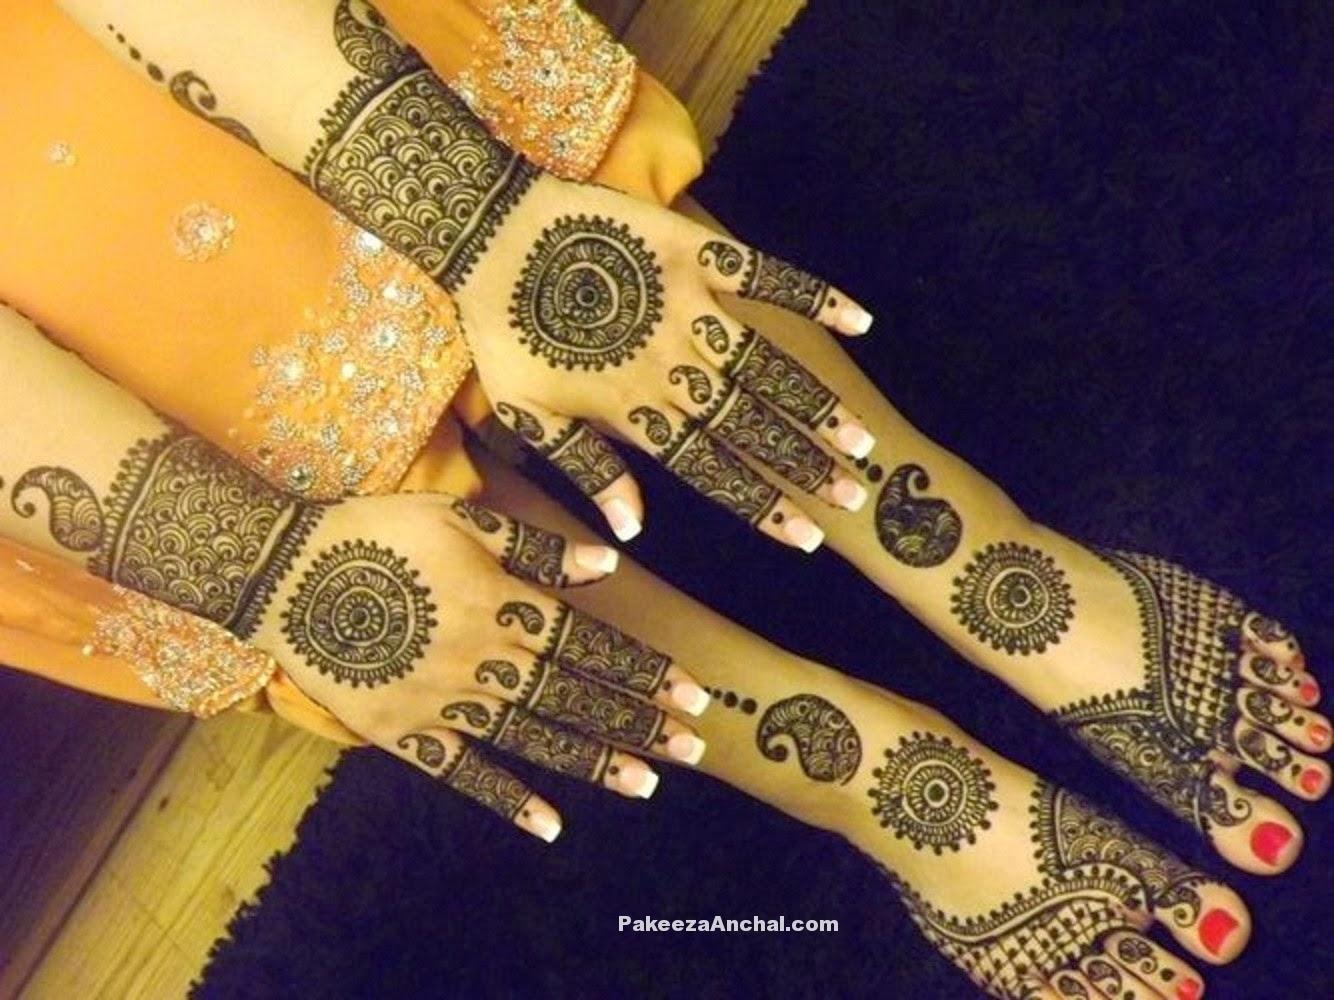 Mehendi Designs For Bride, Top Bridal Mehendi Design - Motif , HD Wallpaper & Backgrounds